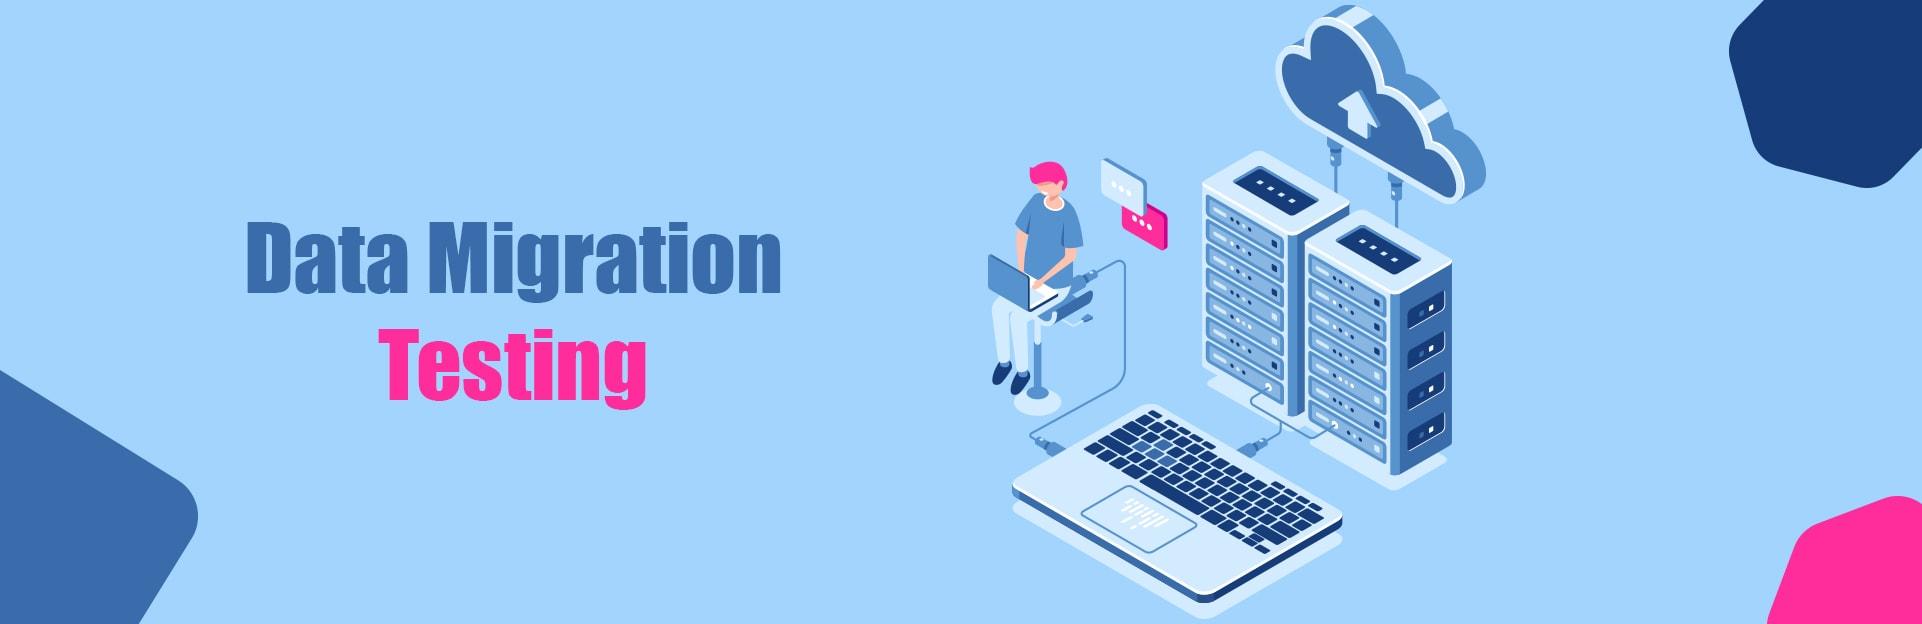 Data-Migration-Testing